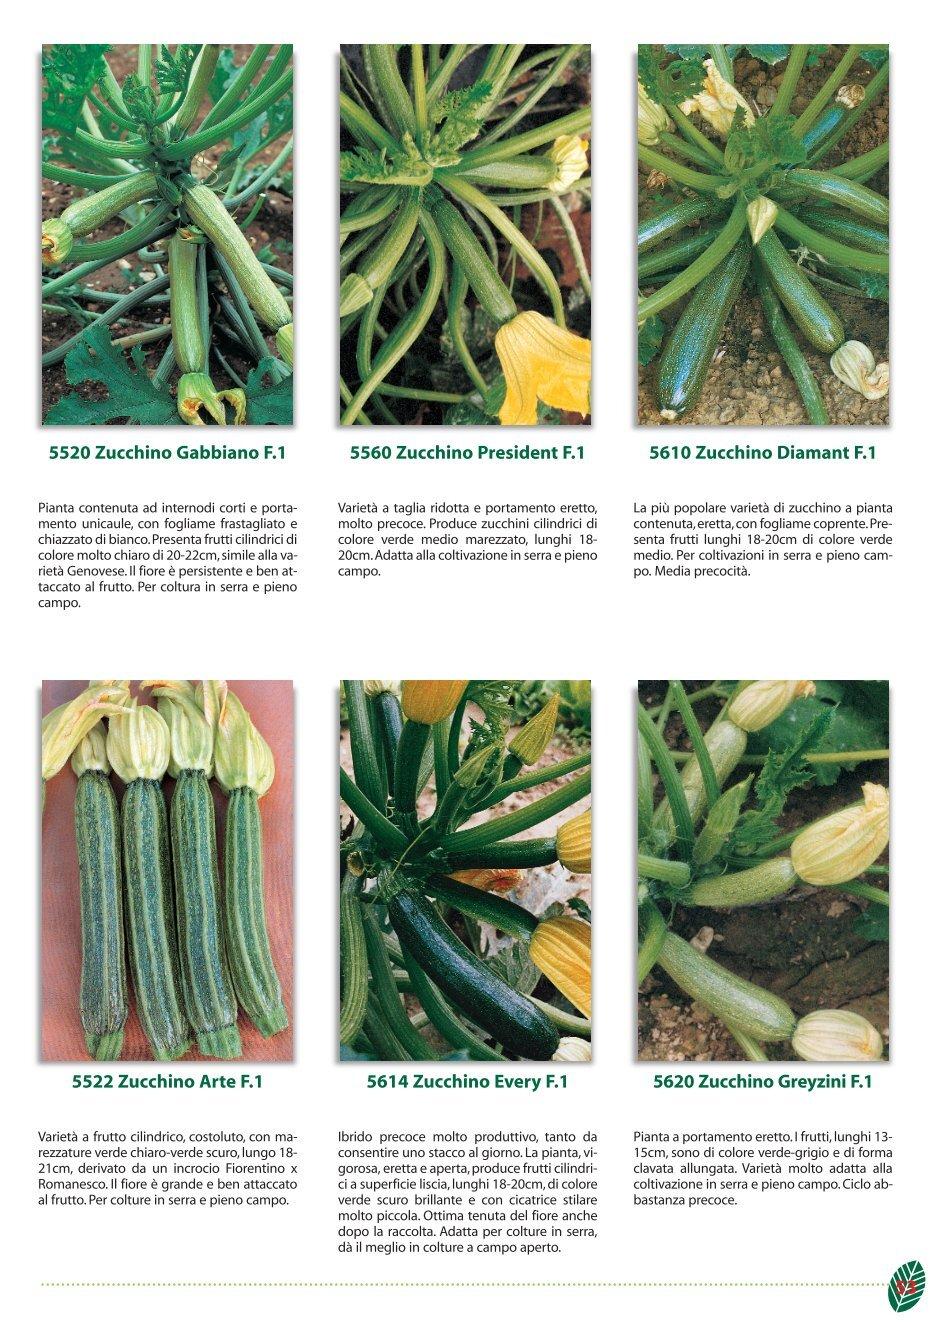 Varietà Zucchine Da Fiore 4 free magazines from foursementi.it